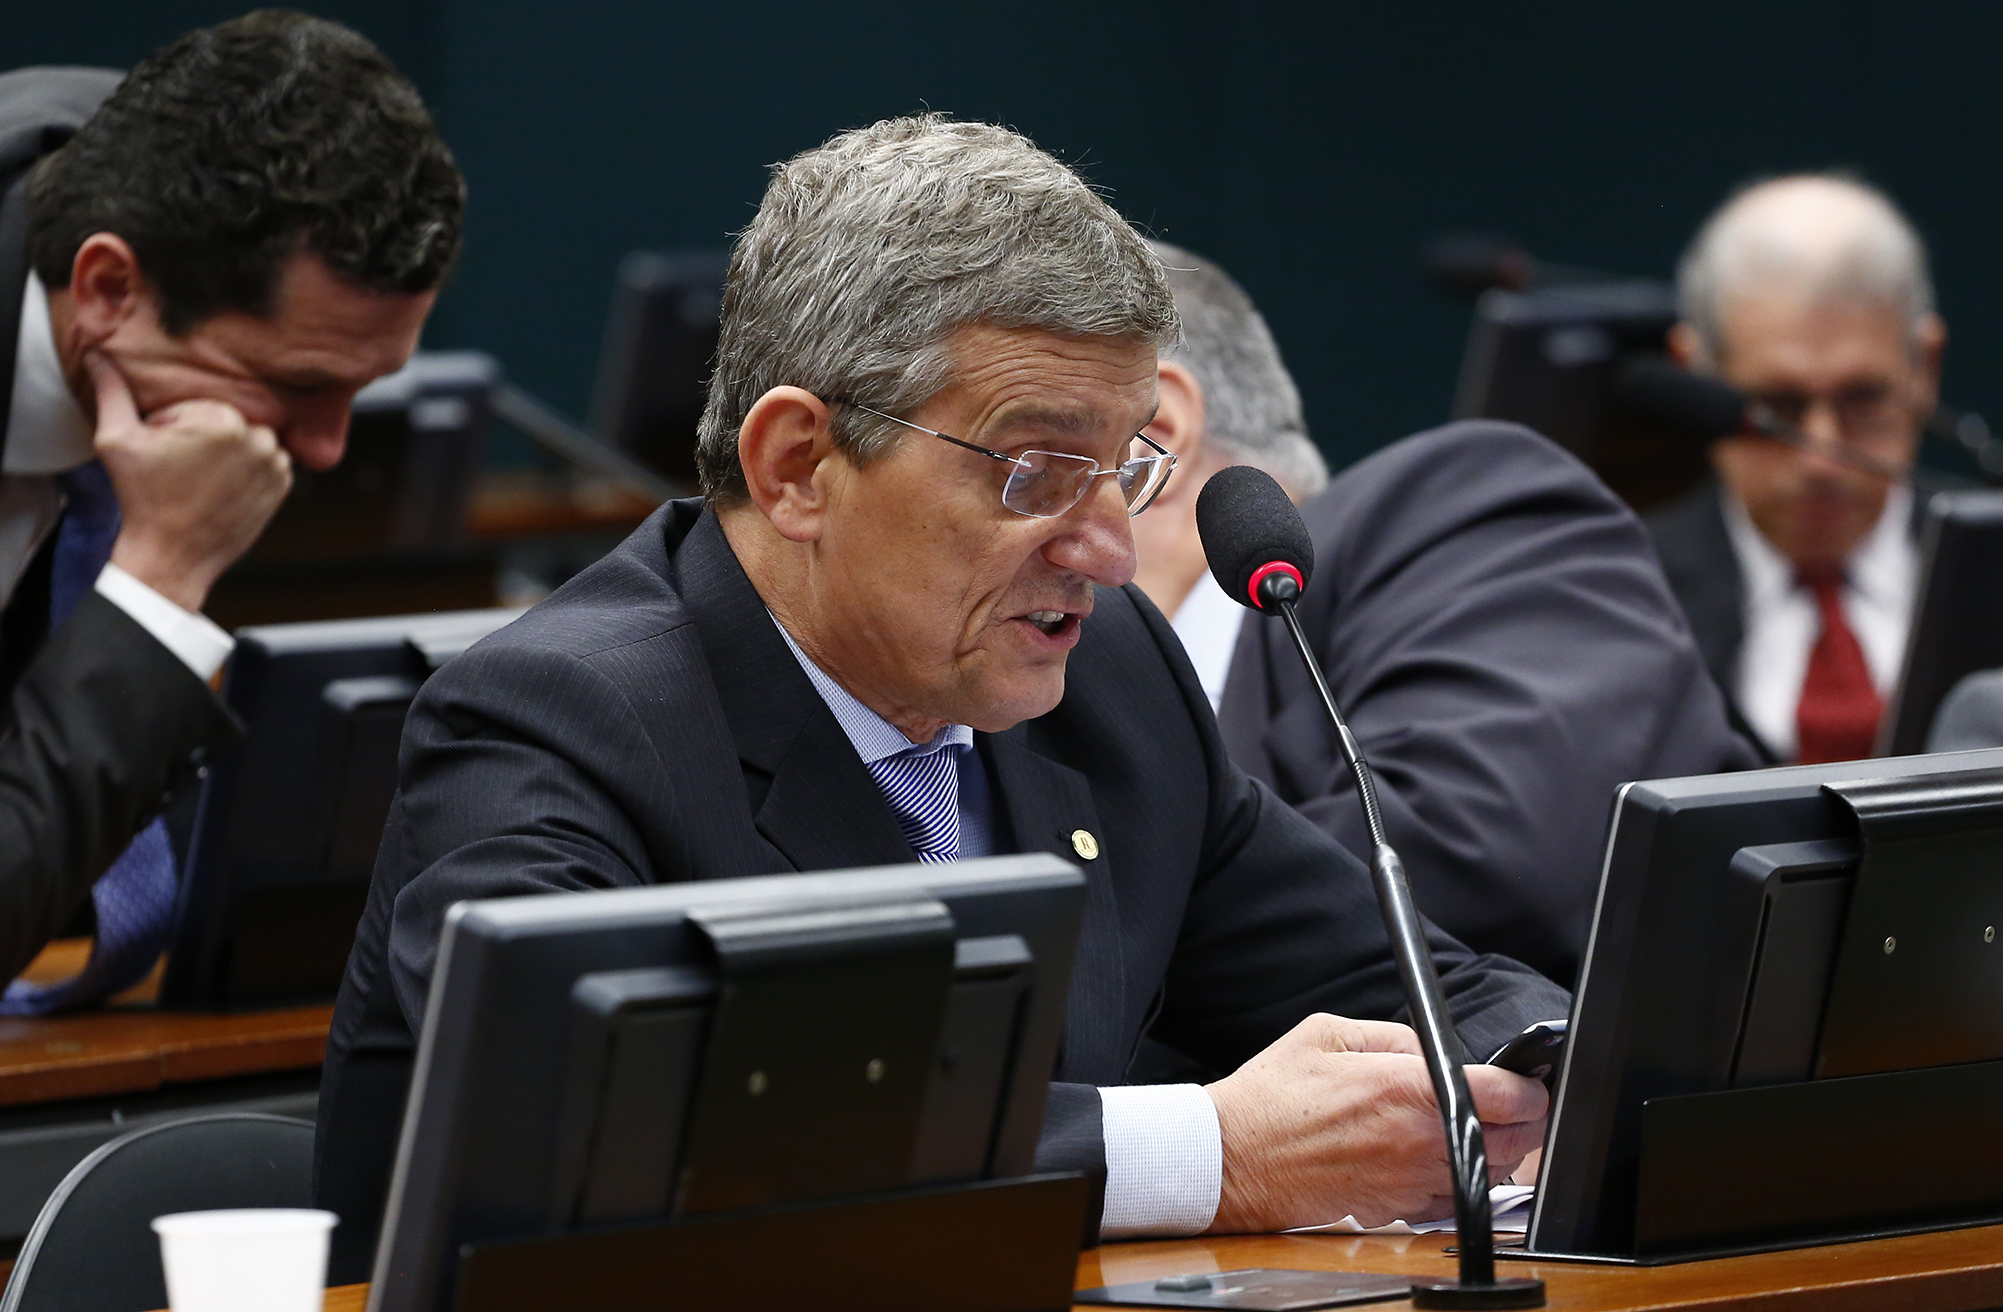 Reunião Ordinária. Dep. Darcísio Perondi (PMDB-RS)